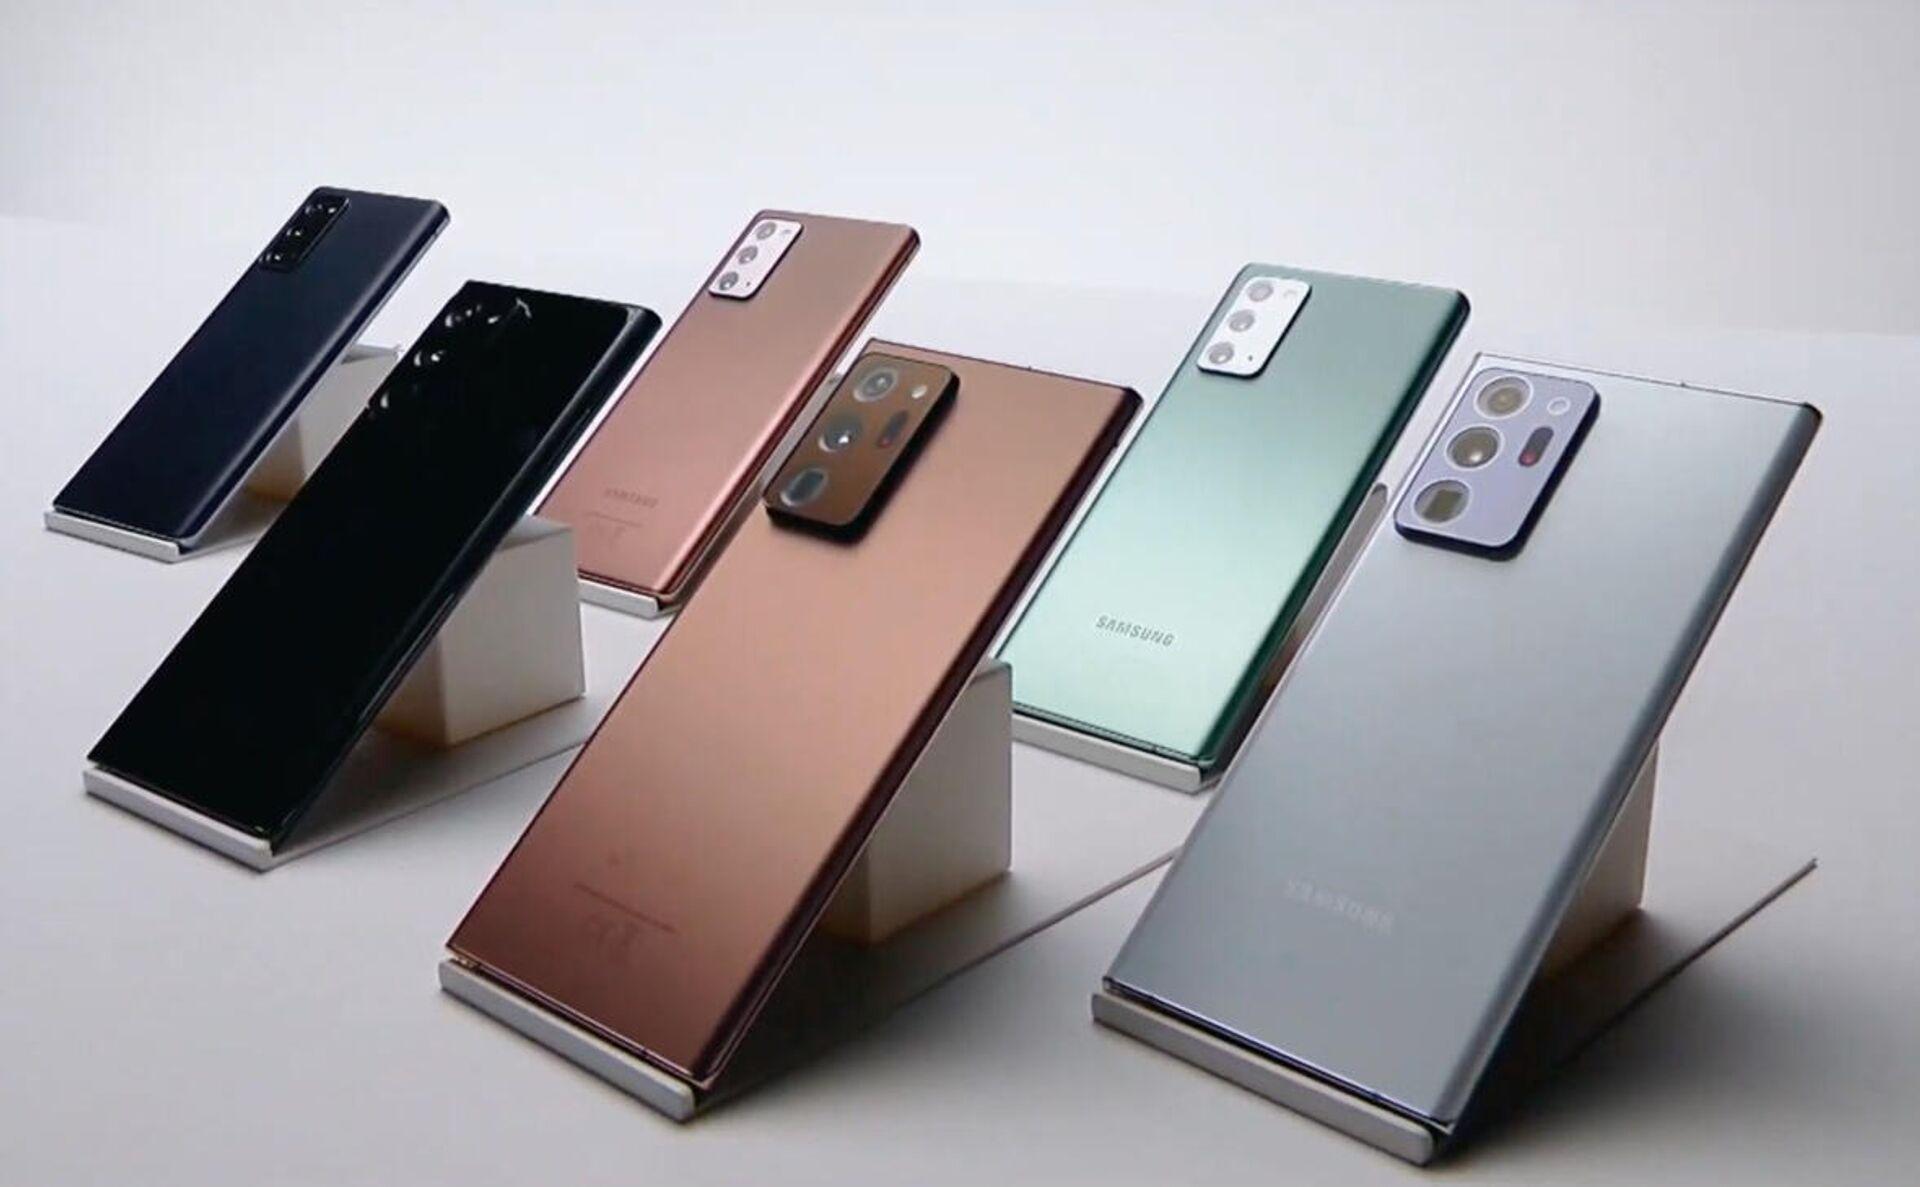 Смартфоны Samsung Galaxy Note20 и Galaxy Note20 Ultra - РИА Новости, 1920, 26.09.2020